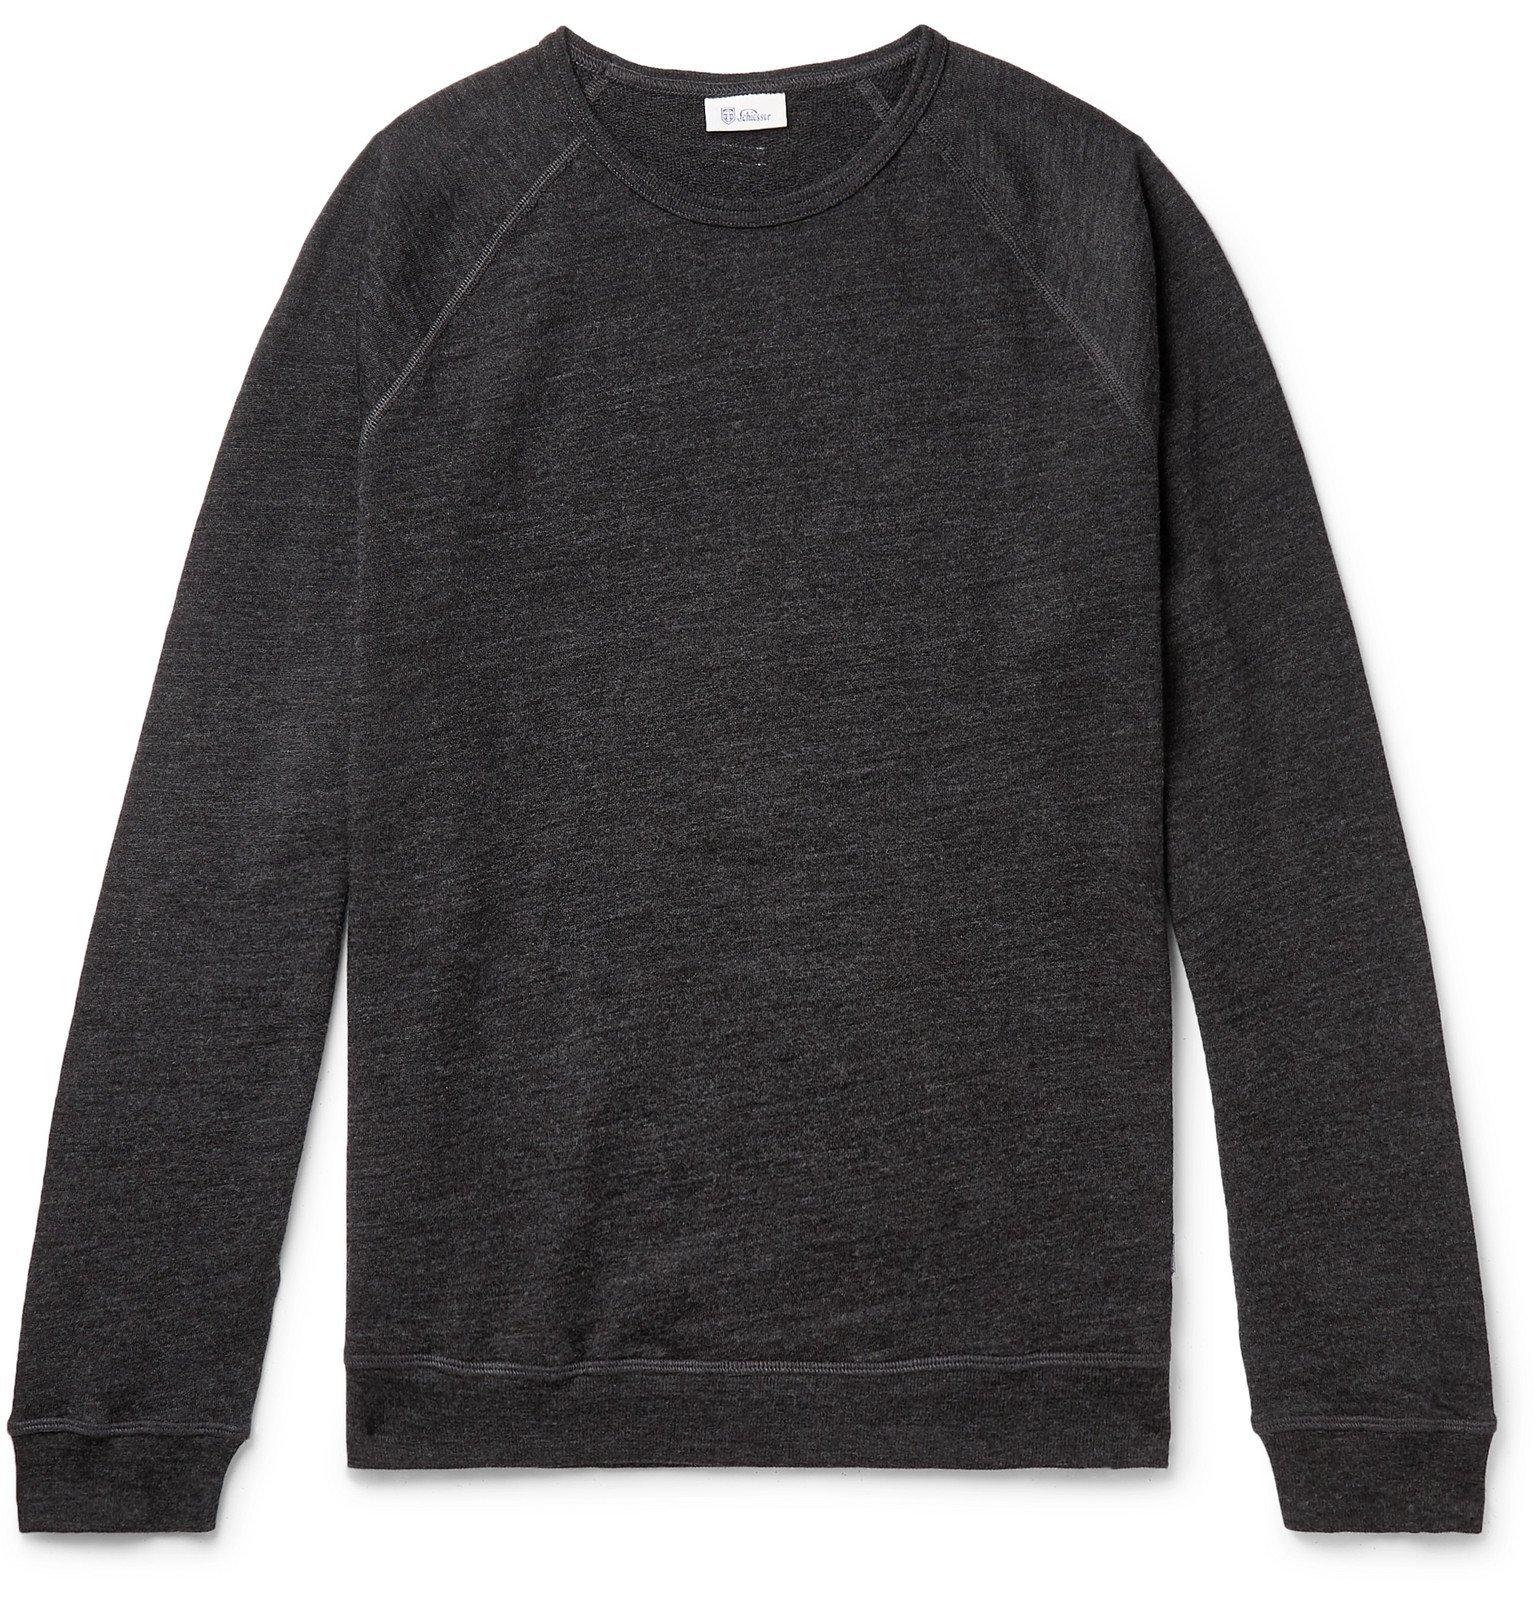 Schiesser - Manuel Mélange Merino Wool Sweatshirt - Gray